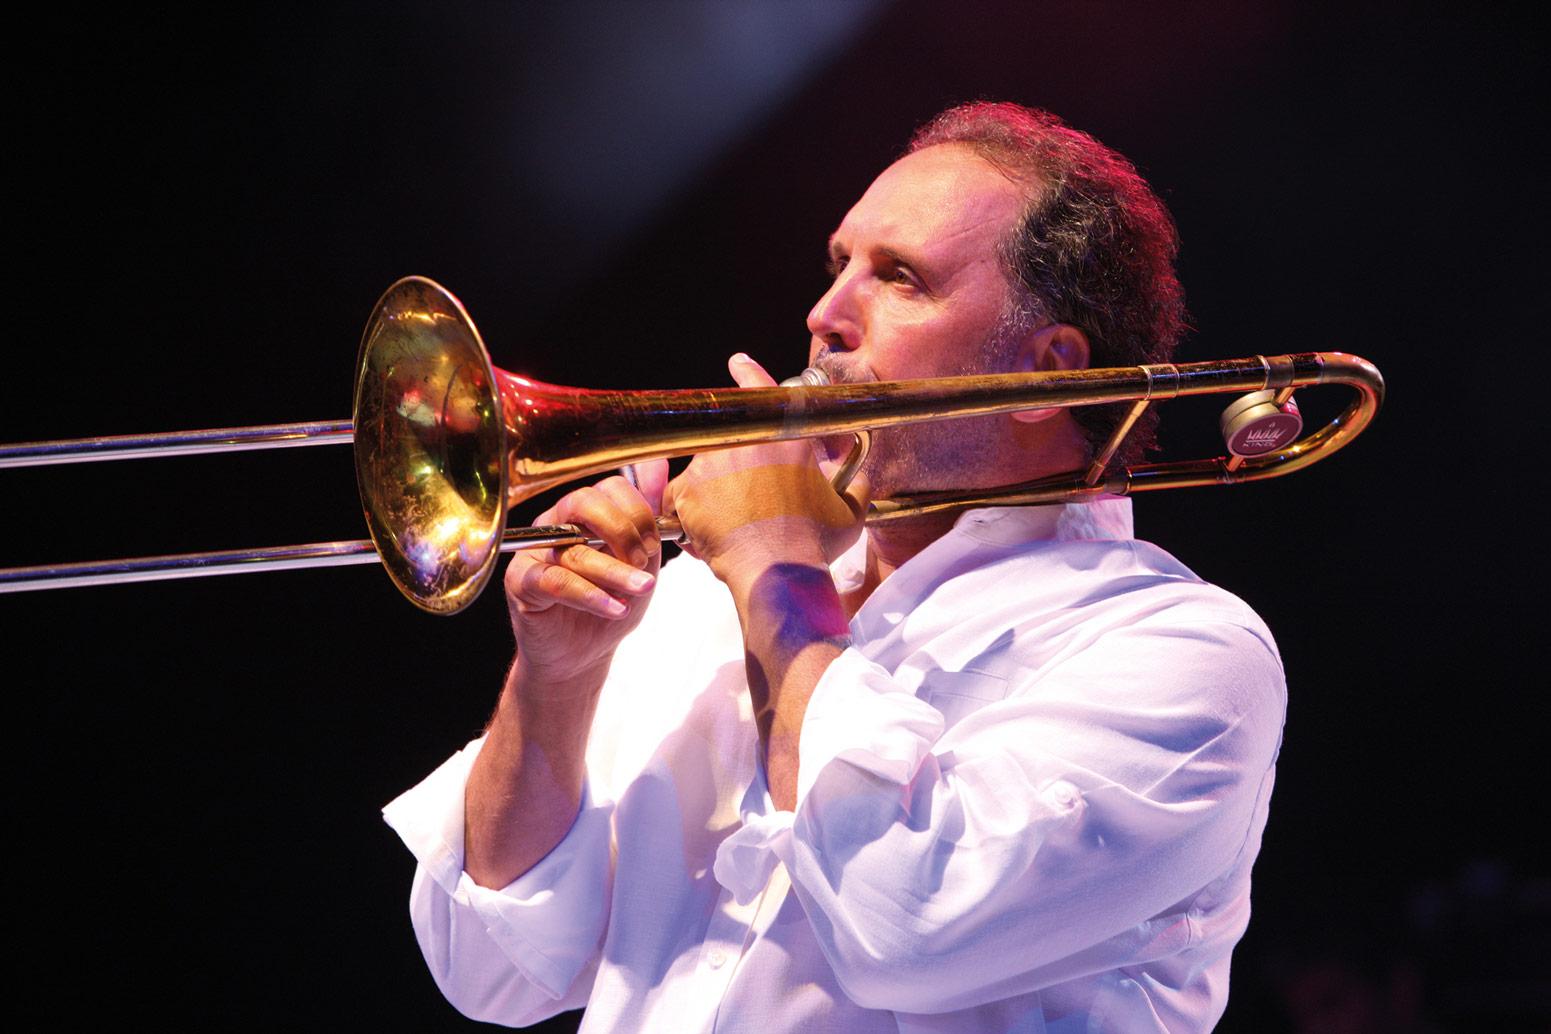 Fatih Erkoç Bursa konseri